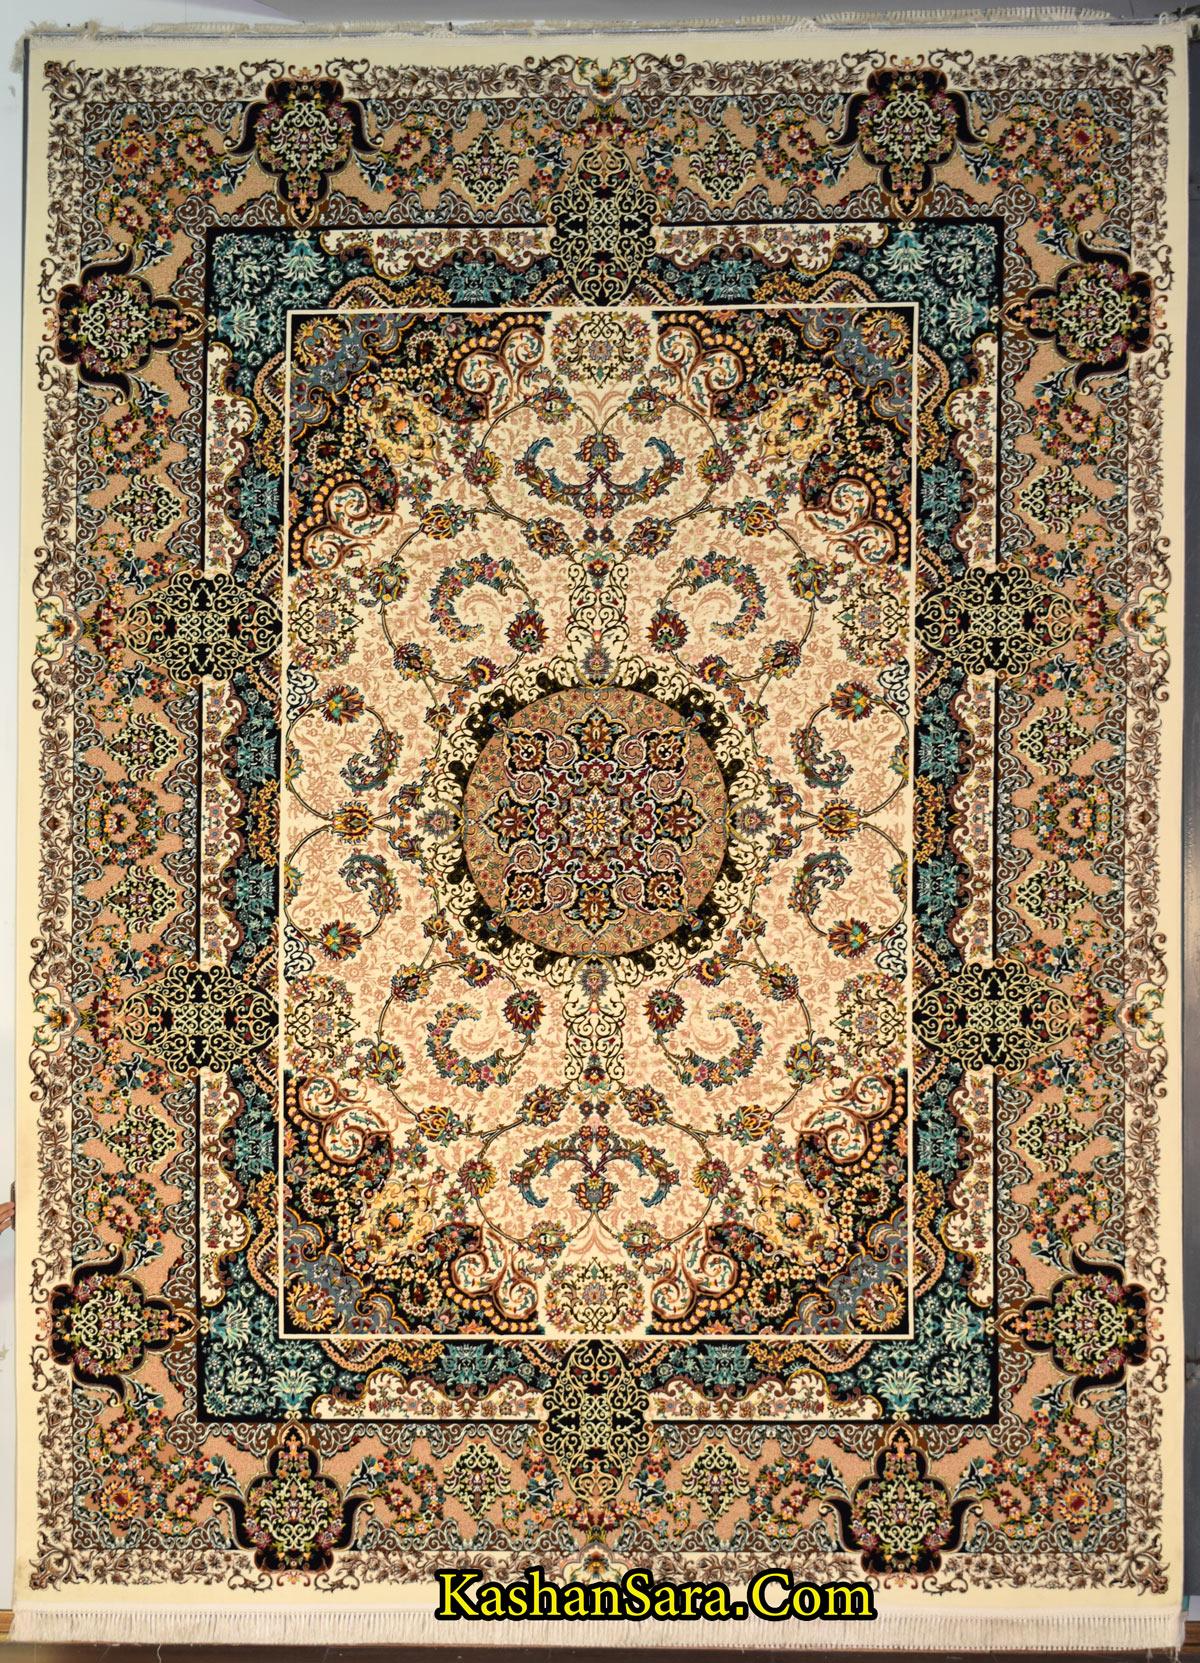 فرش ۱۲۰۰ شانه طرح جانان